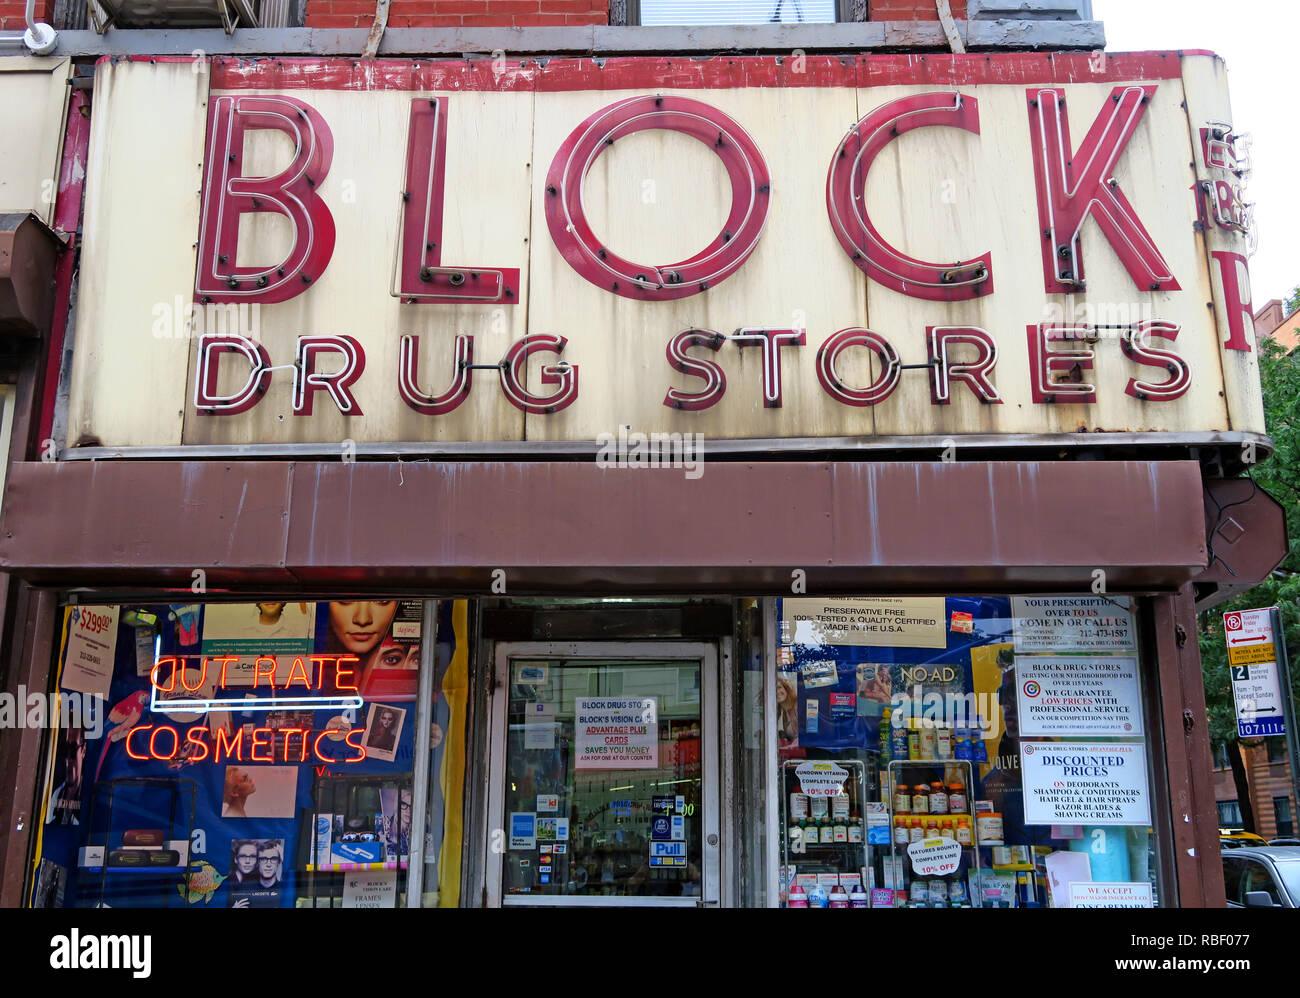 GoTonySmith,@HotpixUK,HotpixUK,NOHO NYC,NYC,New York City,St Marks Place,St Marks Place NYC,New York St Marks Place,street,New York Street,USA,America,City Centre,city,centre,center,city center,East Village,Eastvillage,Block Drug Store,Block,Drugstore,Drug Store,chemist,shop,Chemist Shop,New York Travel Tourism,store,stores,Block Drugstores pharmacy frontage,in red,NY 10003,exterior,American Drug store,Block Drug Company,Russia,Russian,Alexander Block